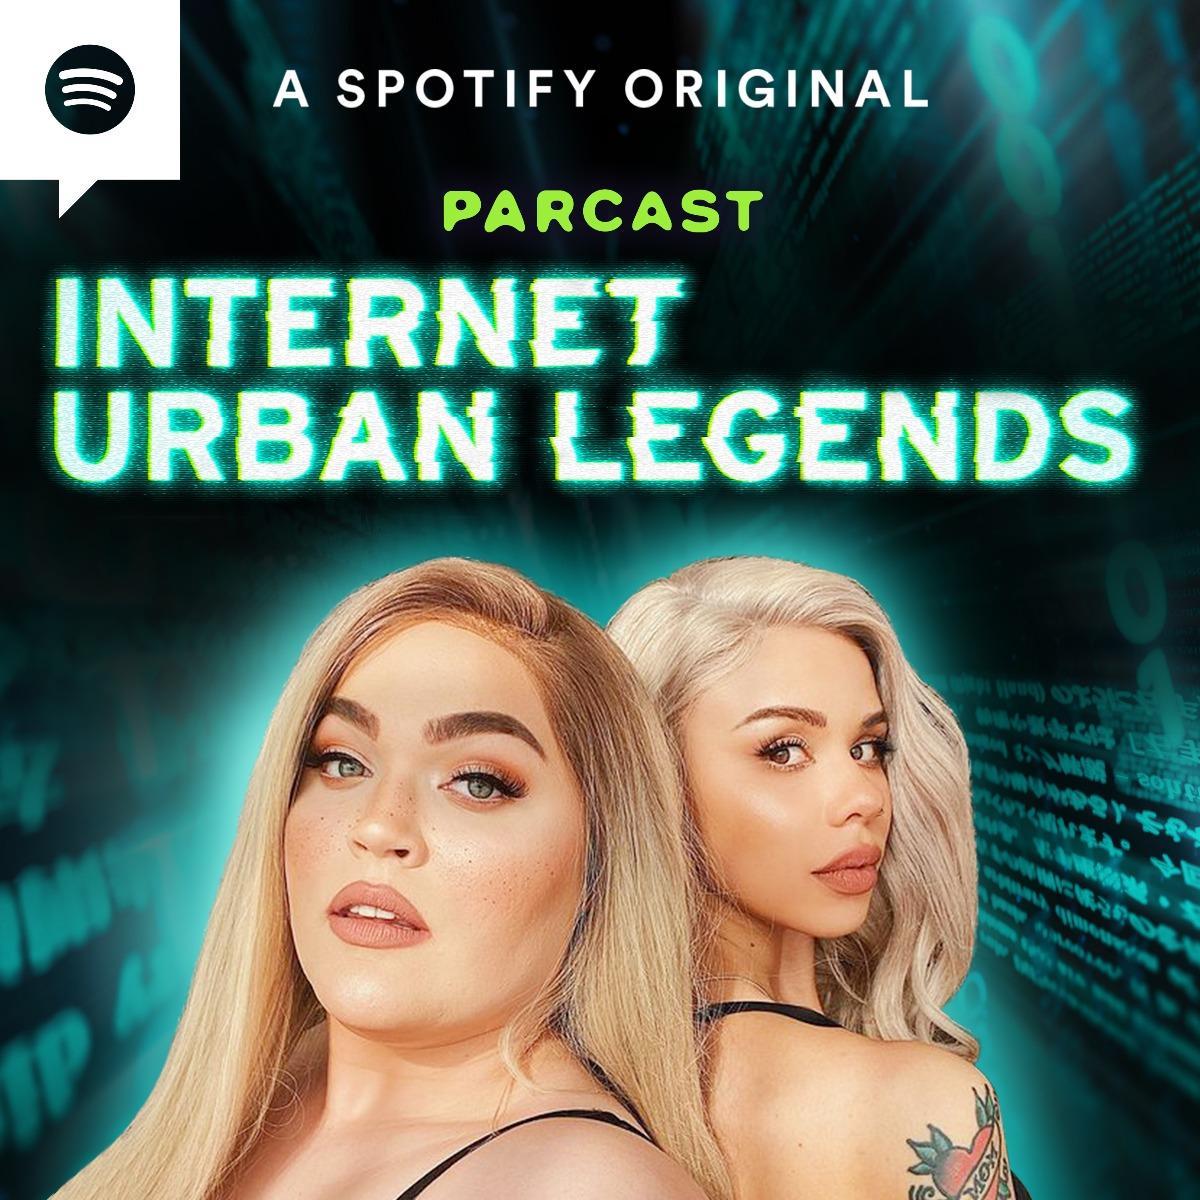 internet urban legends podcast hosts